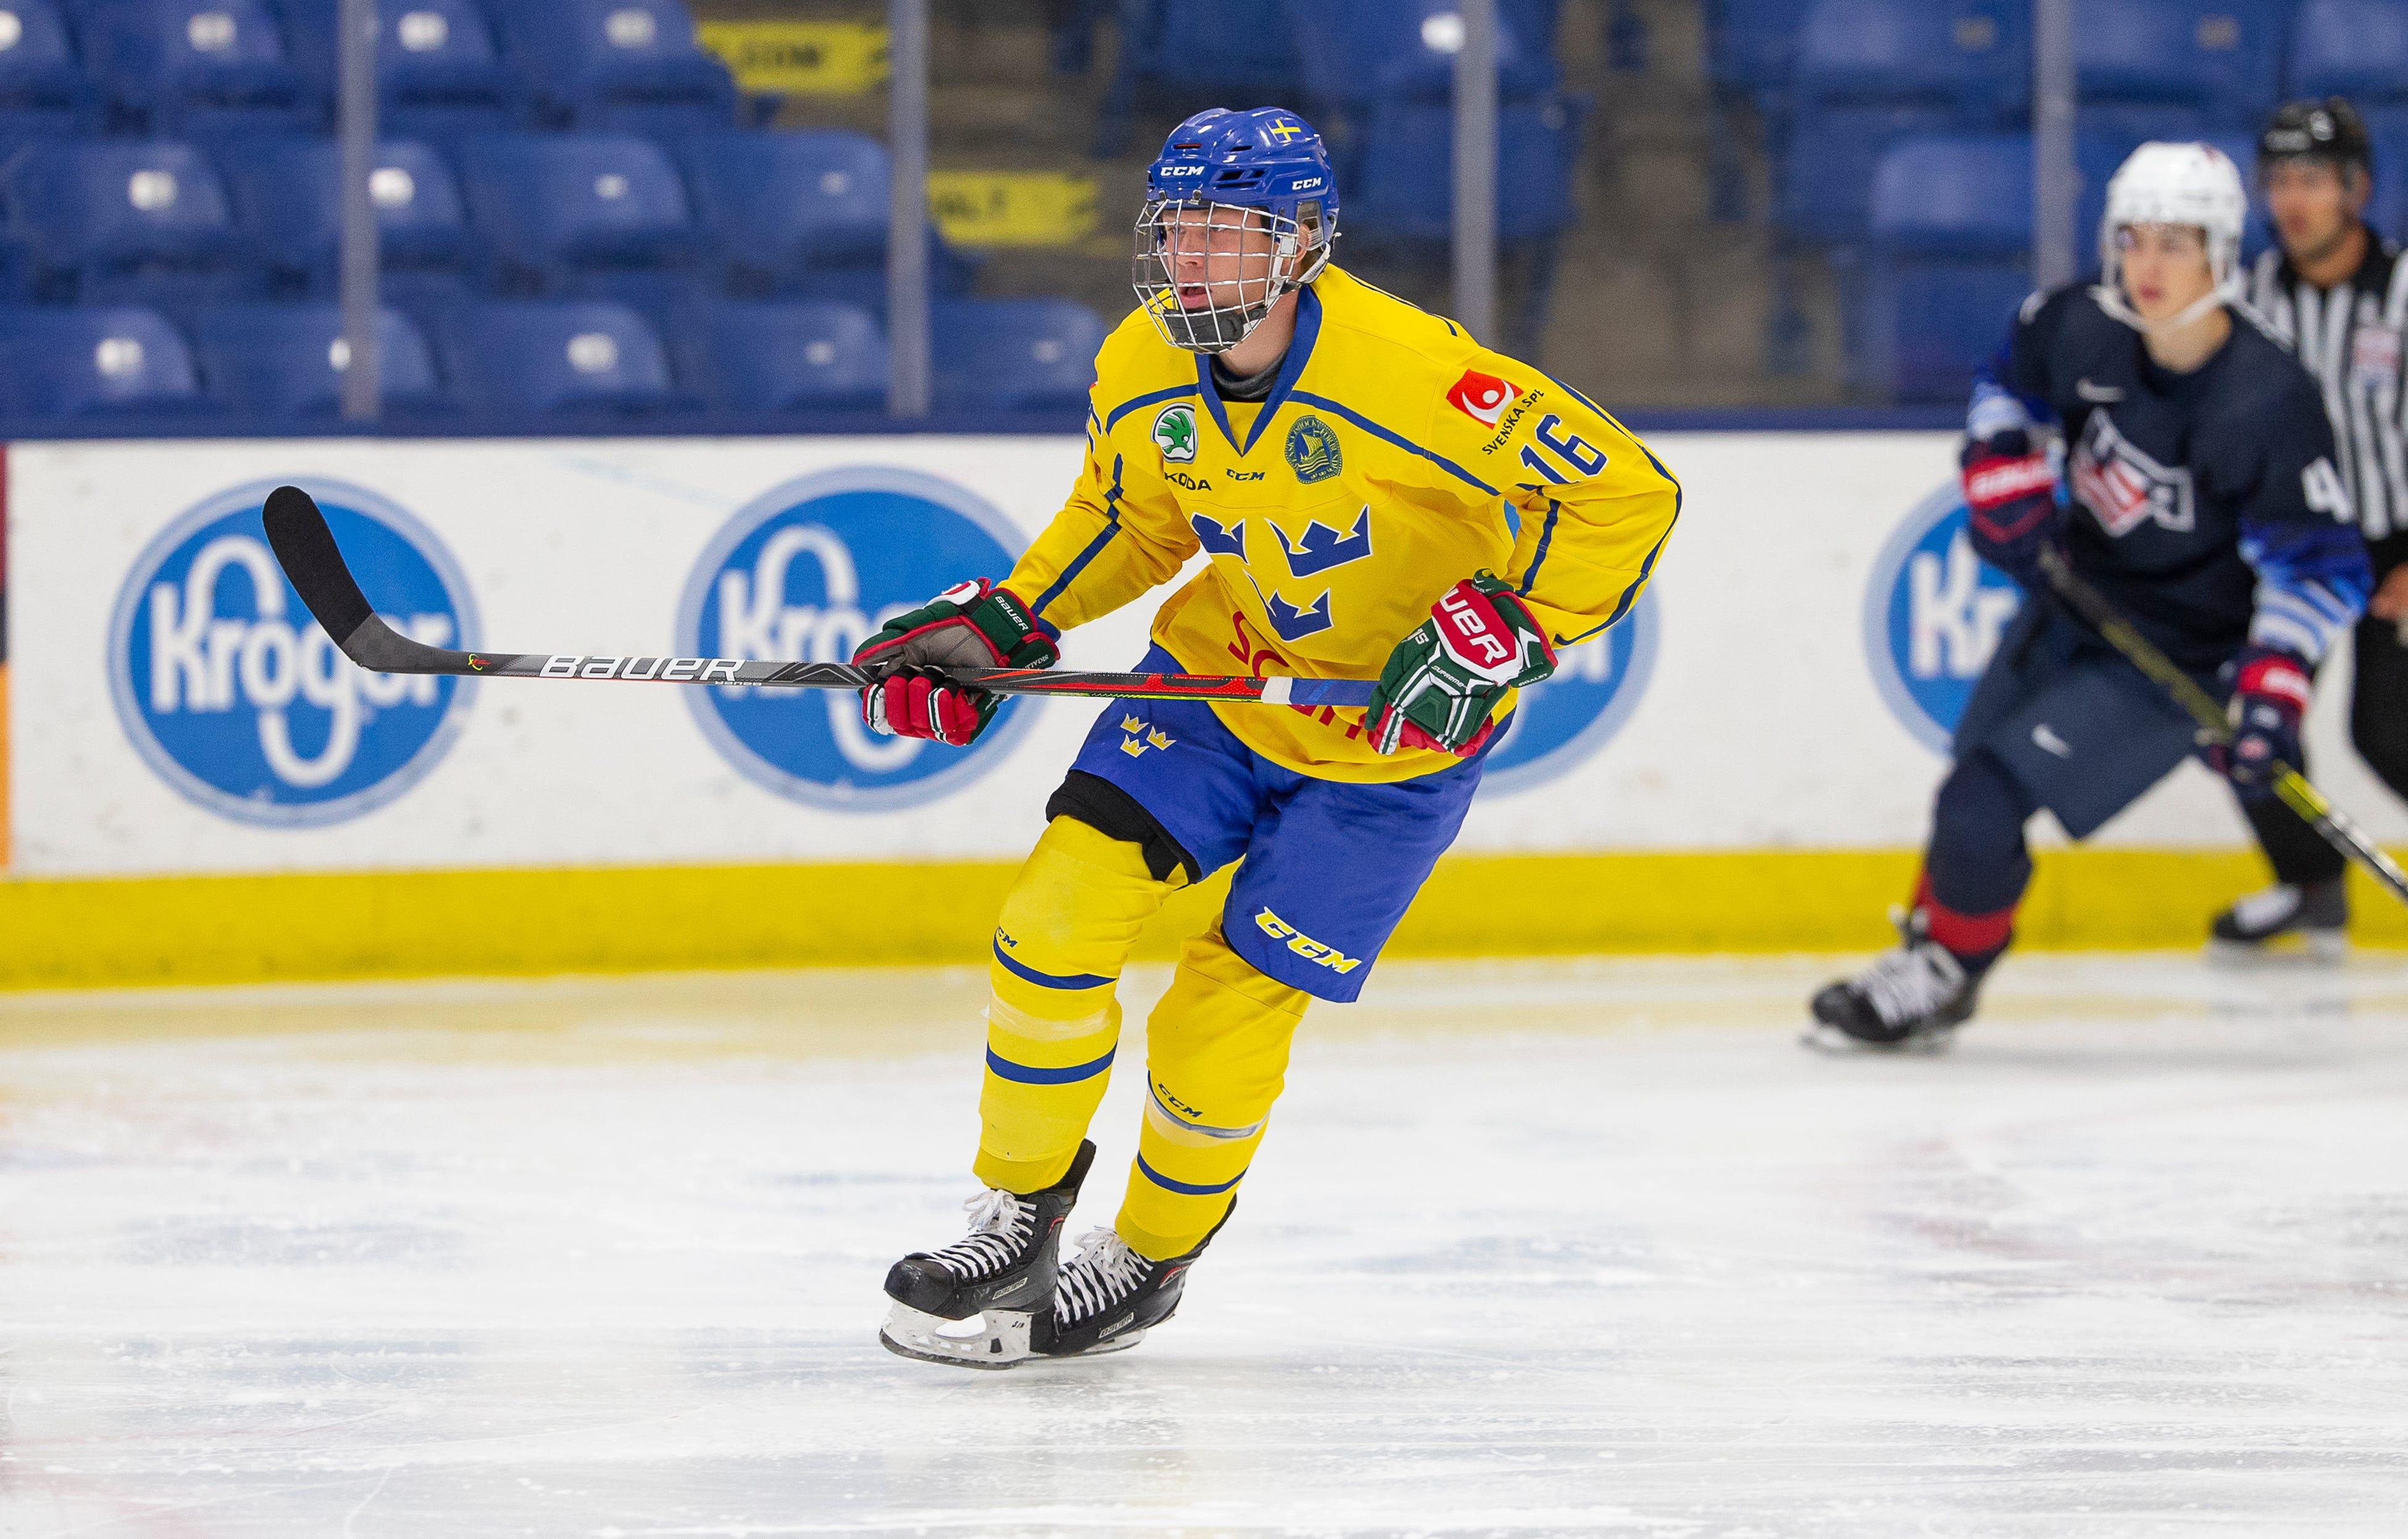 Sweden S Lucas Raymond Flies Under Radar Similar To Steve Yzerman S Draft Season